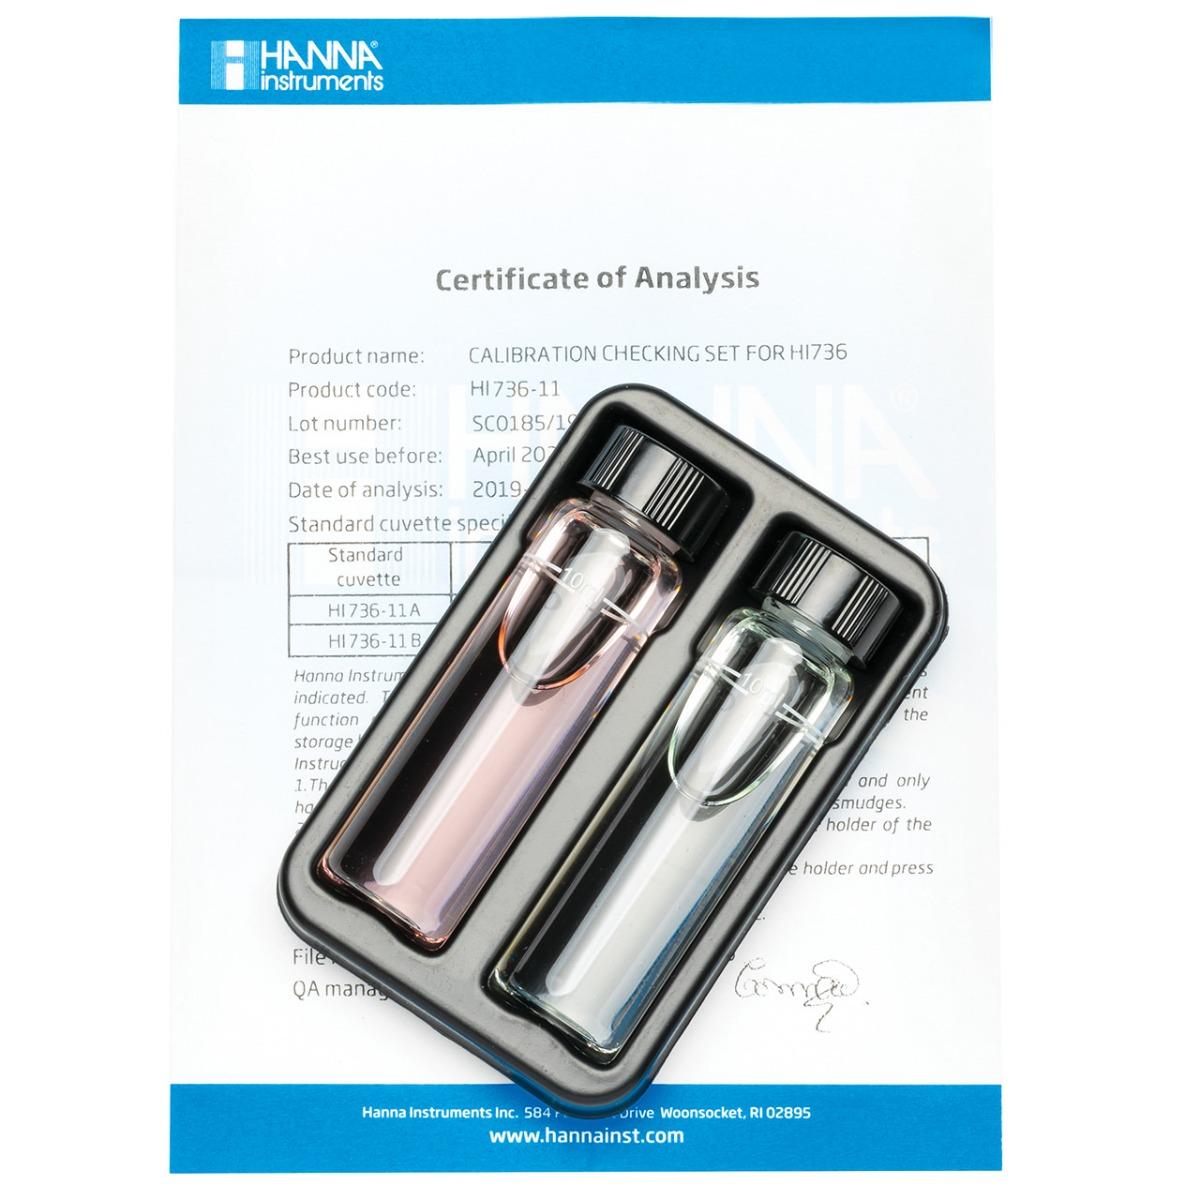 HI736-11 Phosphorus Ultra Low Range Checker® HC Calibration Set